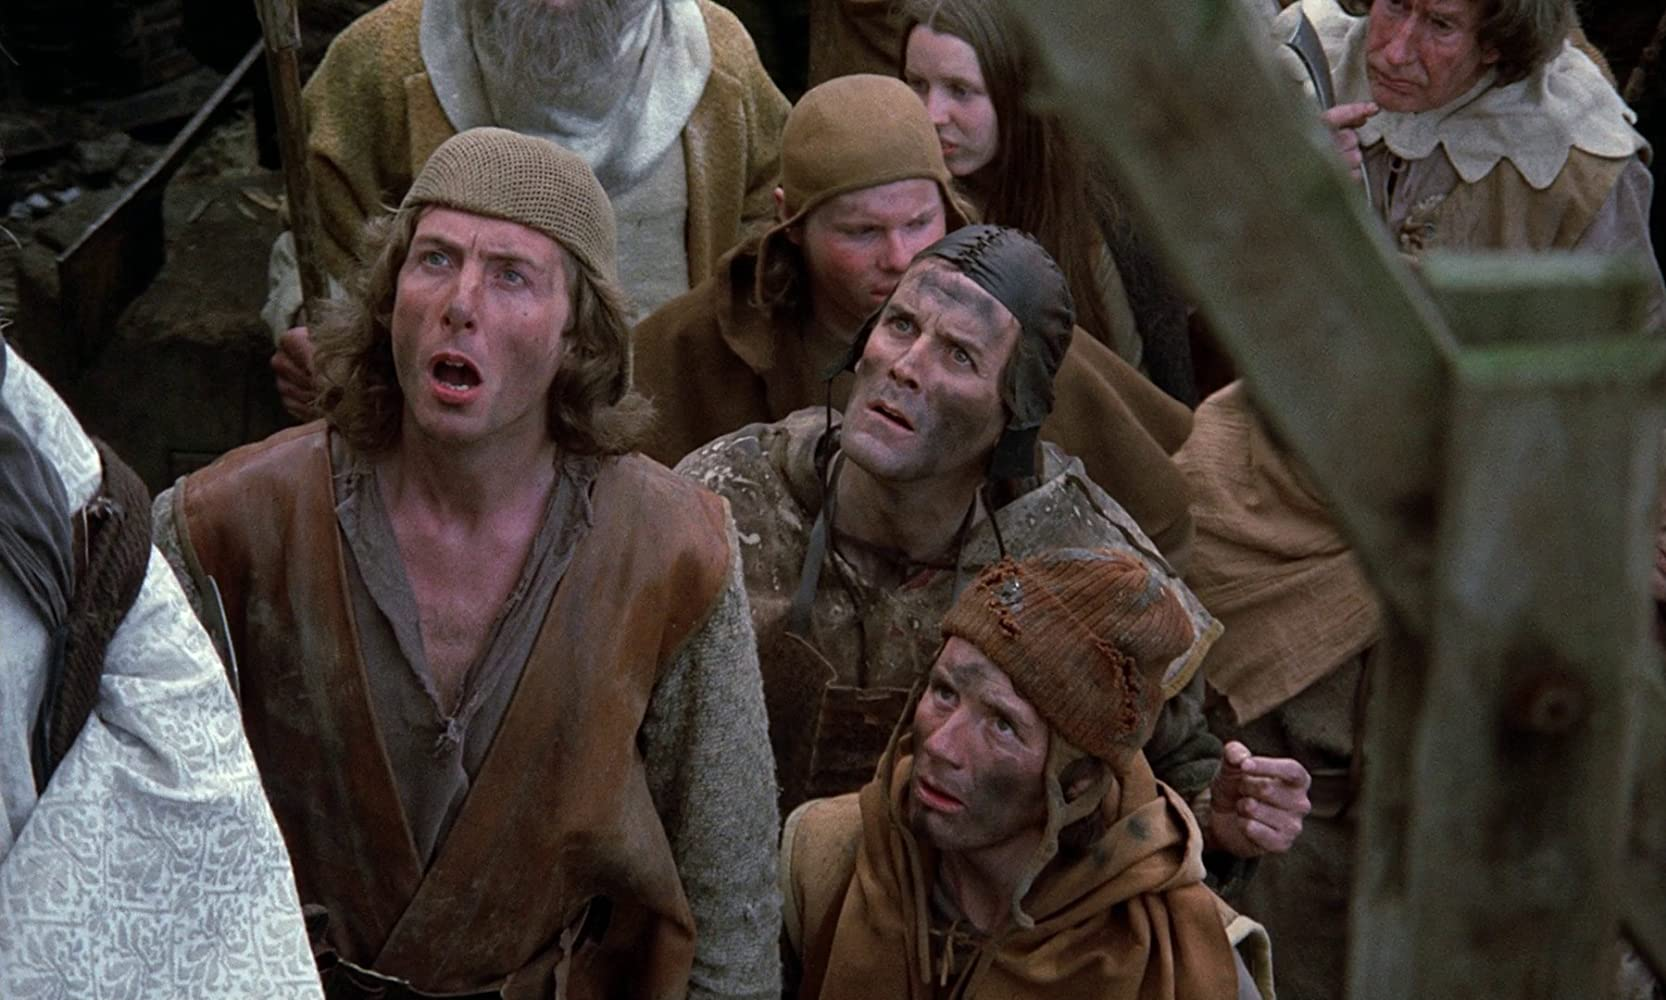 Монти Пайтон и священный Грааль (Monty Python and the Holy Grail) 1975